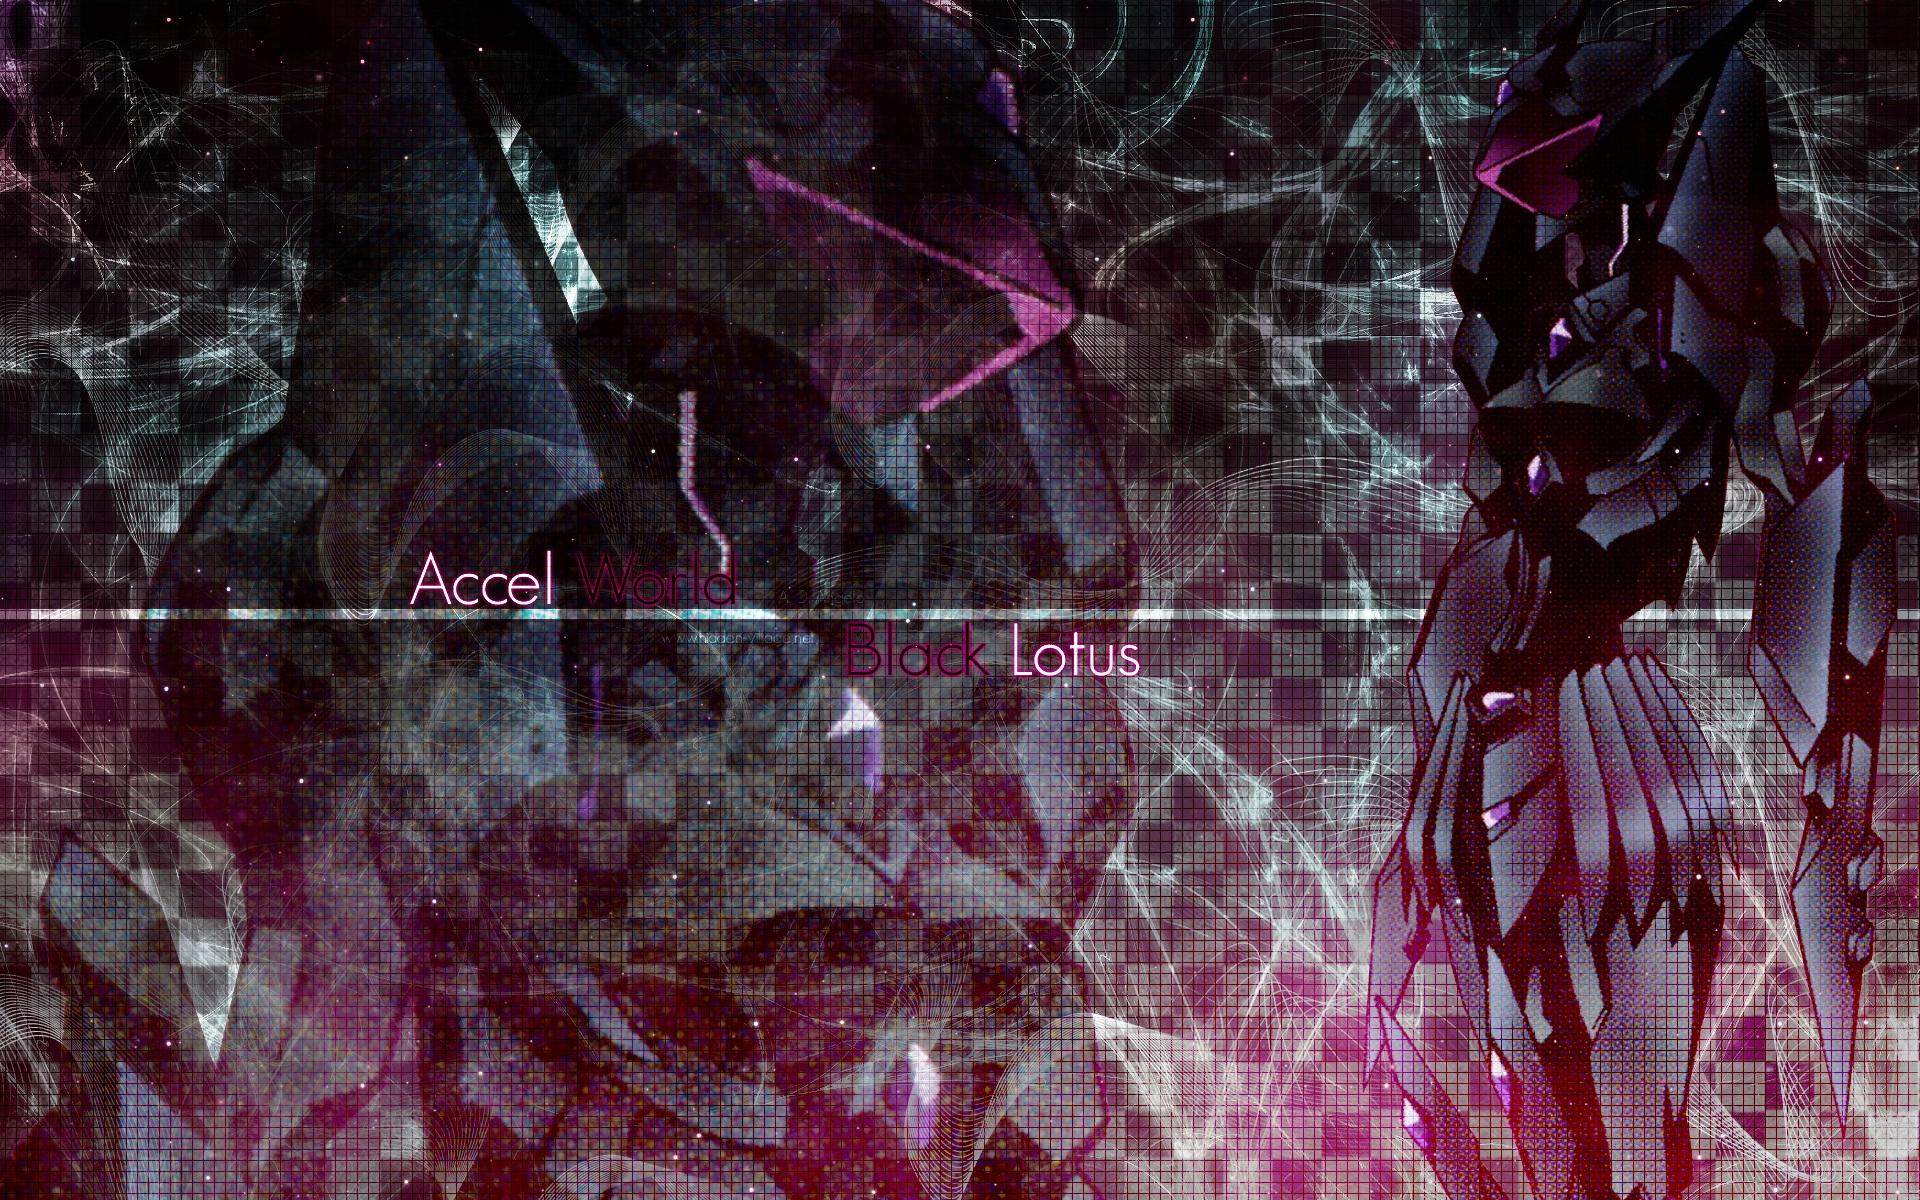 Black Lotus Kuroyukihime Wallpaper 1428356 Zerochan Anime